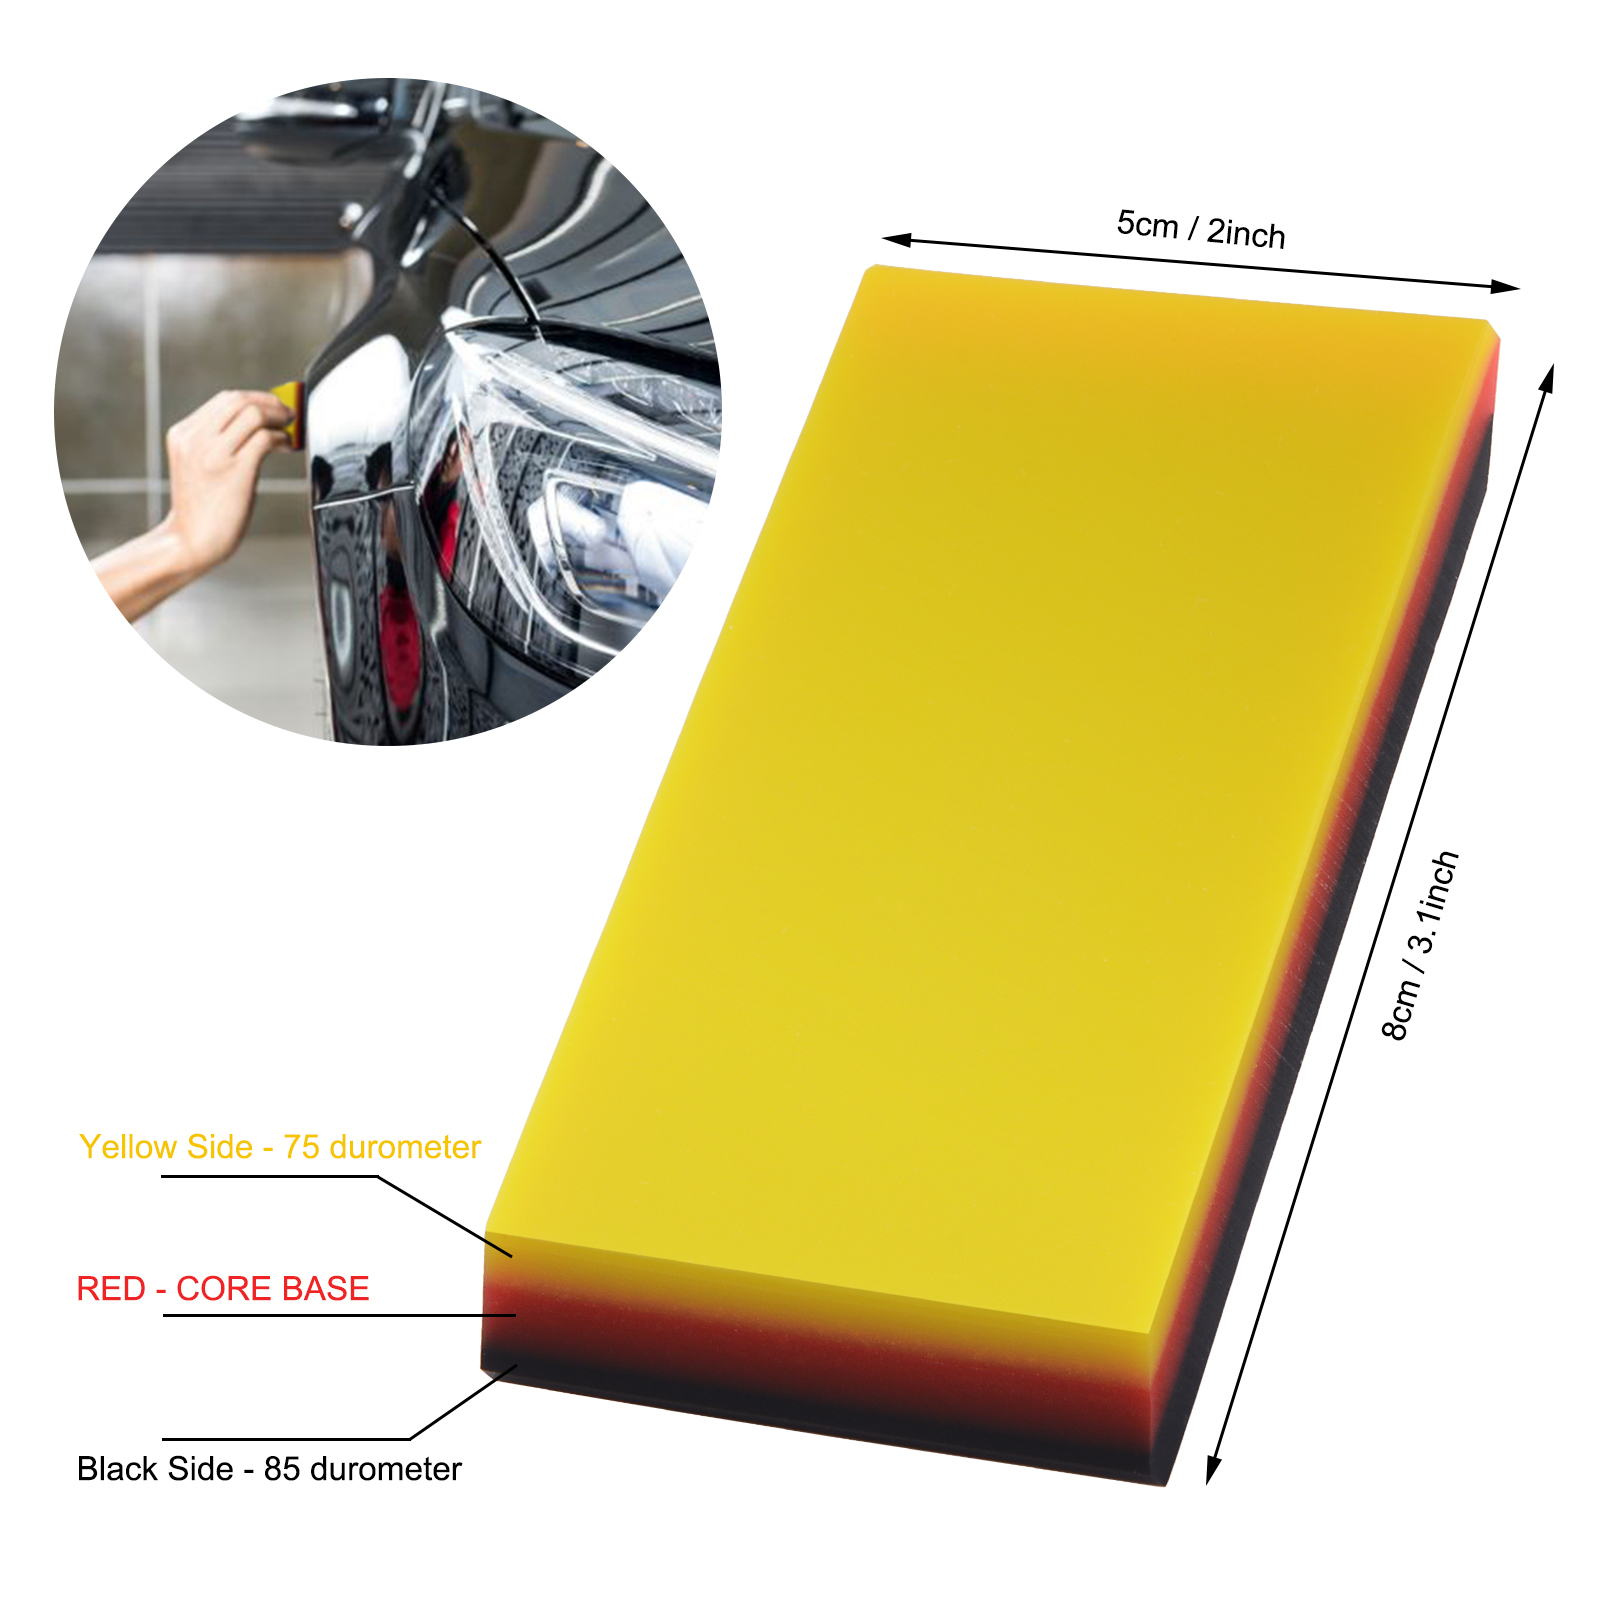 FOSHIO 2in1 Soft Carbon Fiber Protective Film Install Squeegee Scraper Vinyl Wrap Car Window Tint Tool Auto Car Cleaning Brush